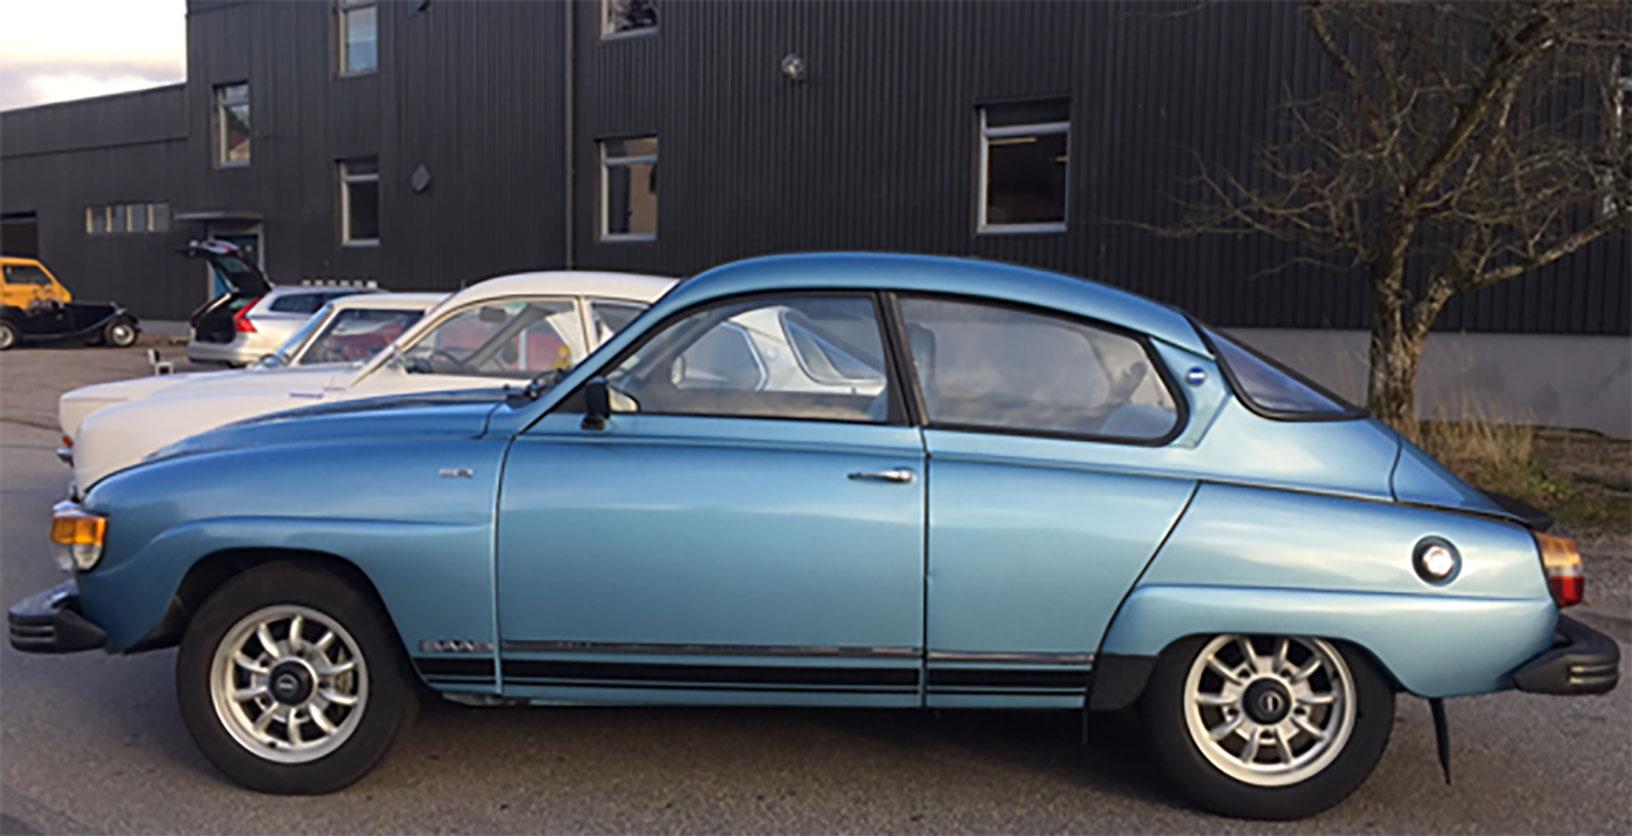 Car Auctions Ny >> Unik Saab på Bilweb Auctions den 19:e november! på Bilweb Auctions